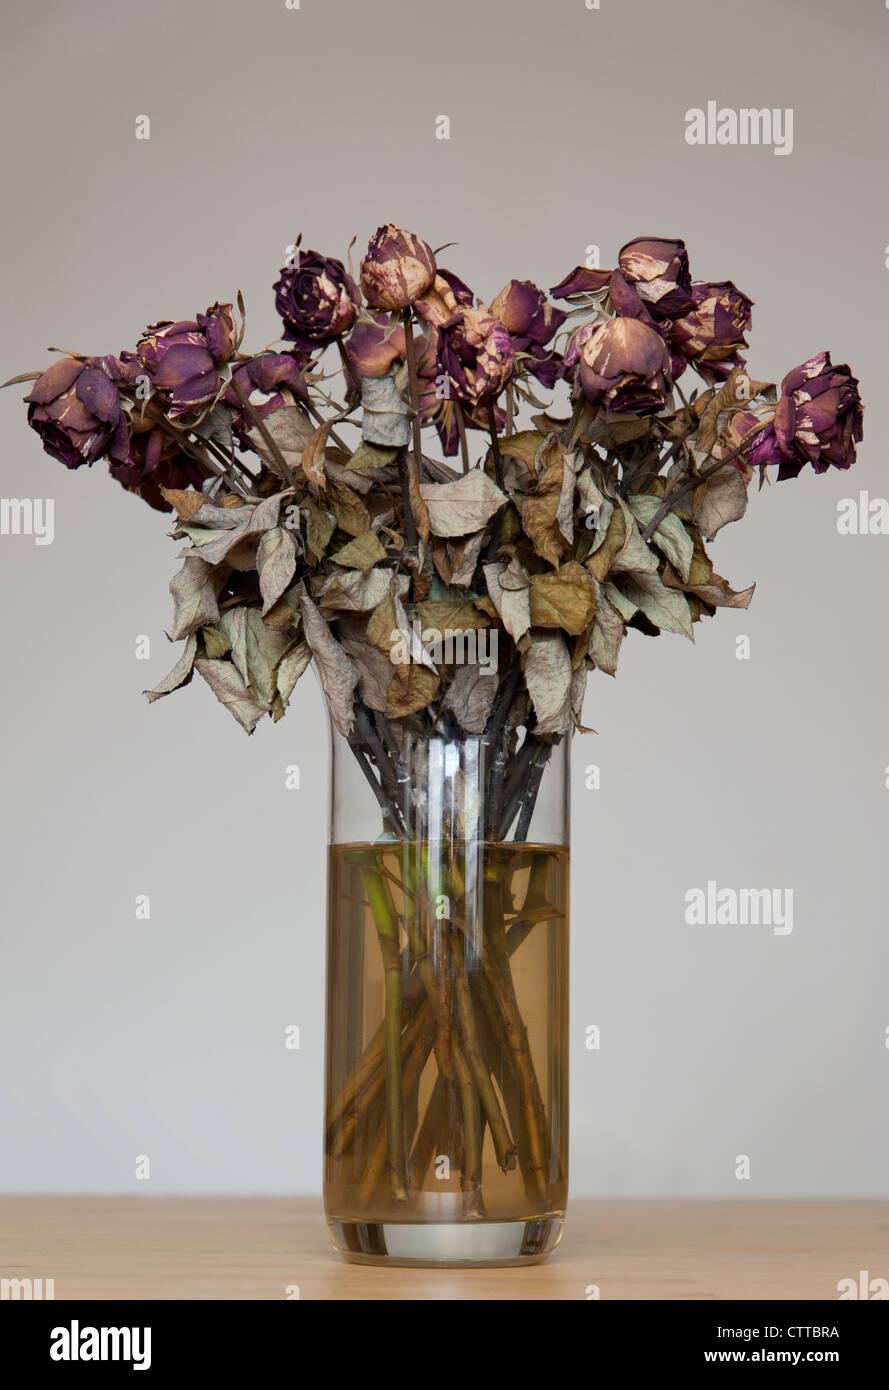 Vase of dead flowers still life concept stock photo royalty vase of dead flowers still life concept reviewsmspy